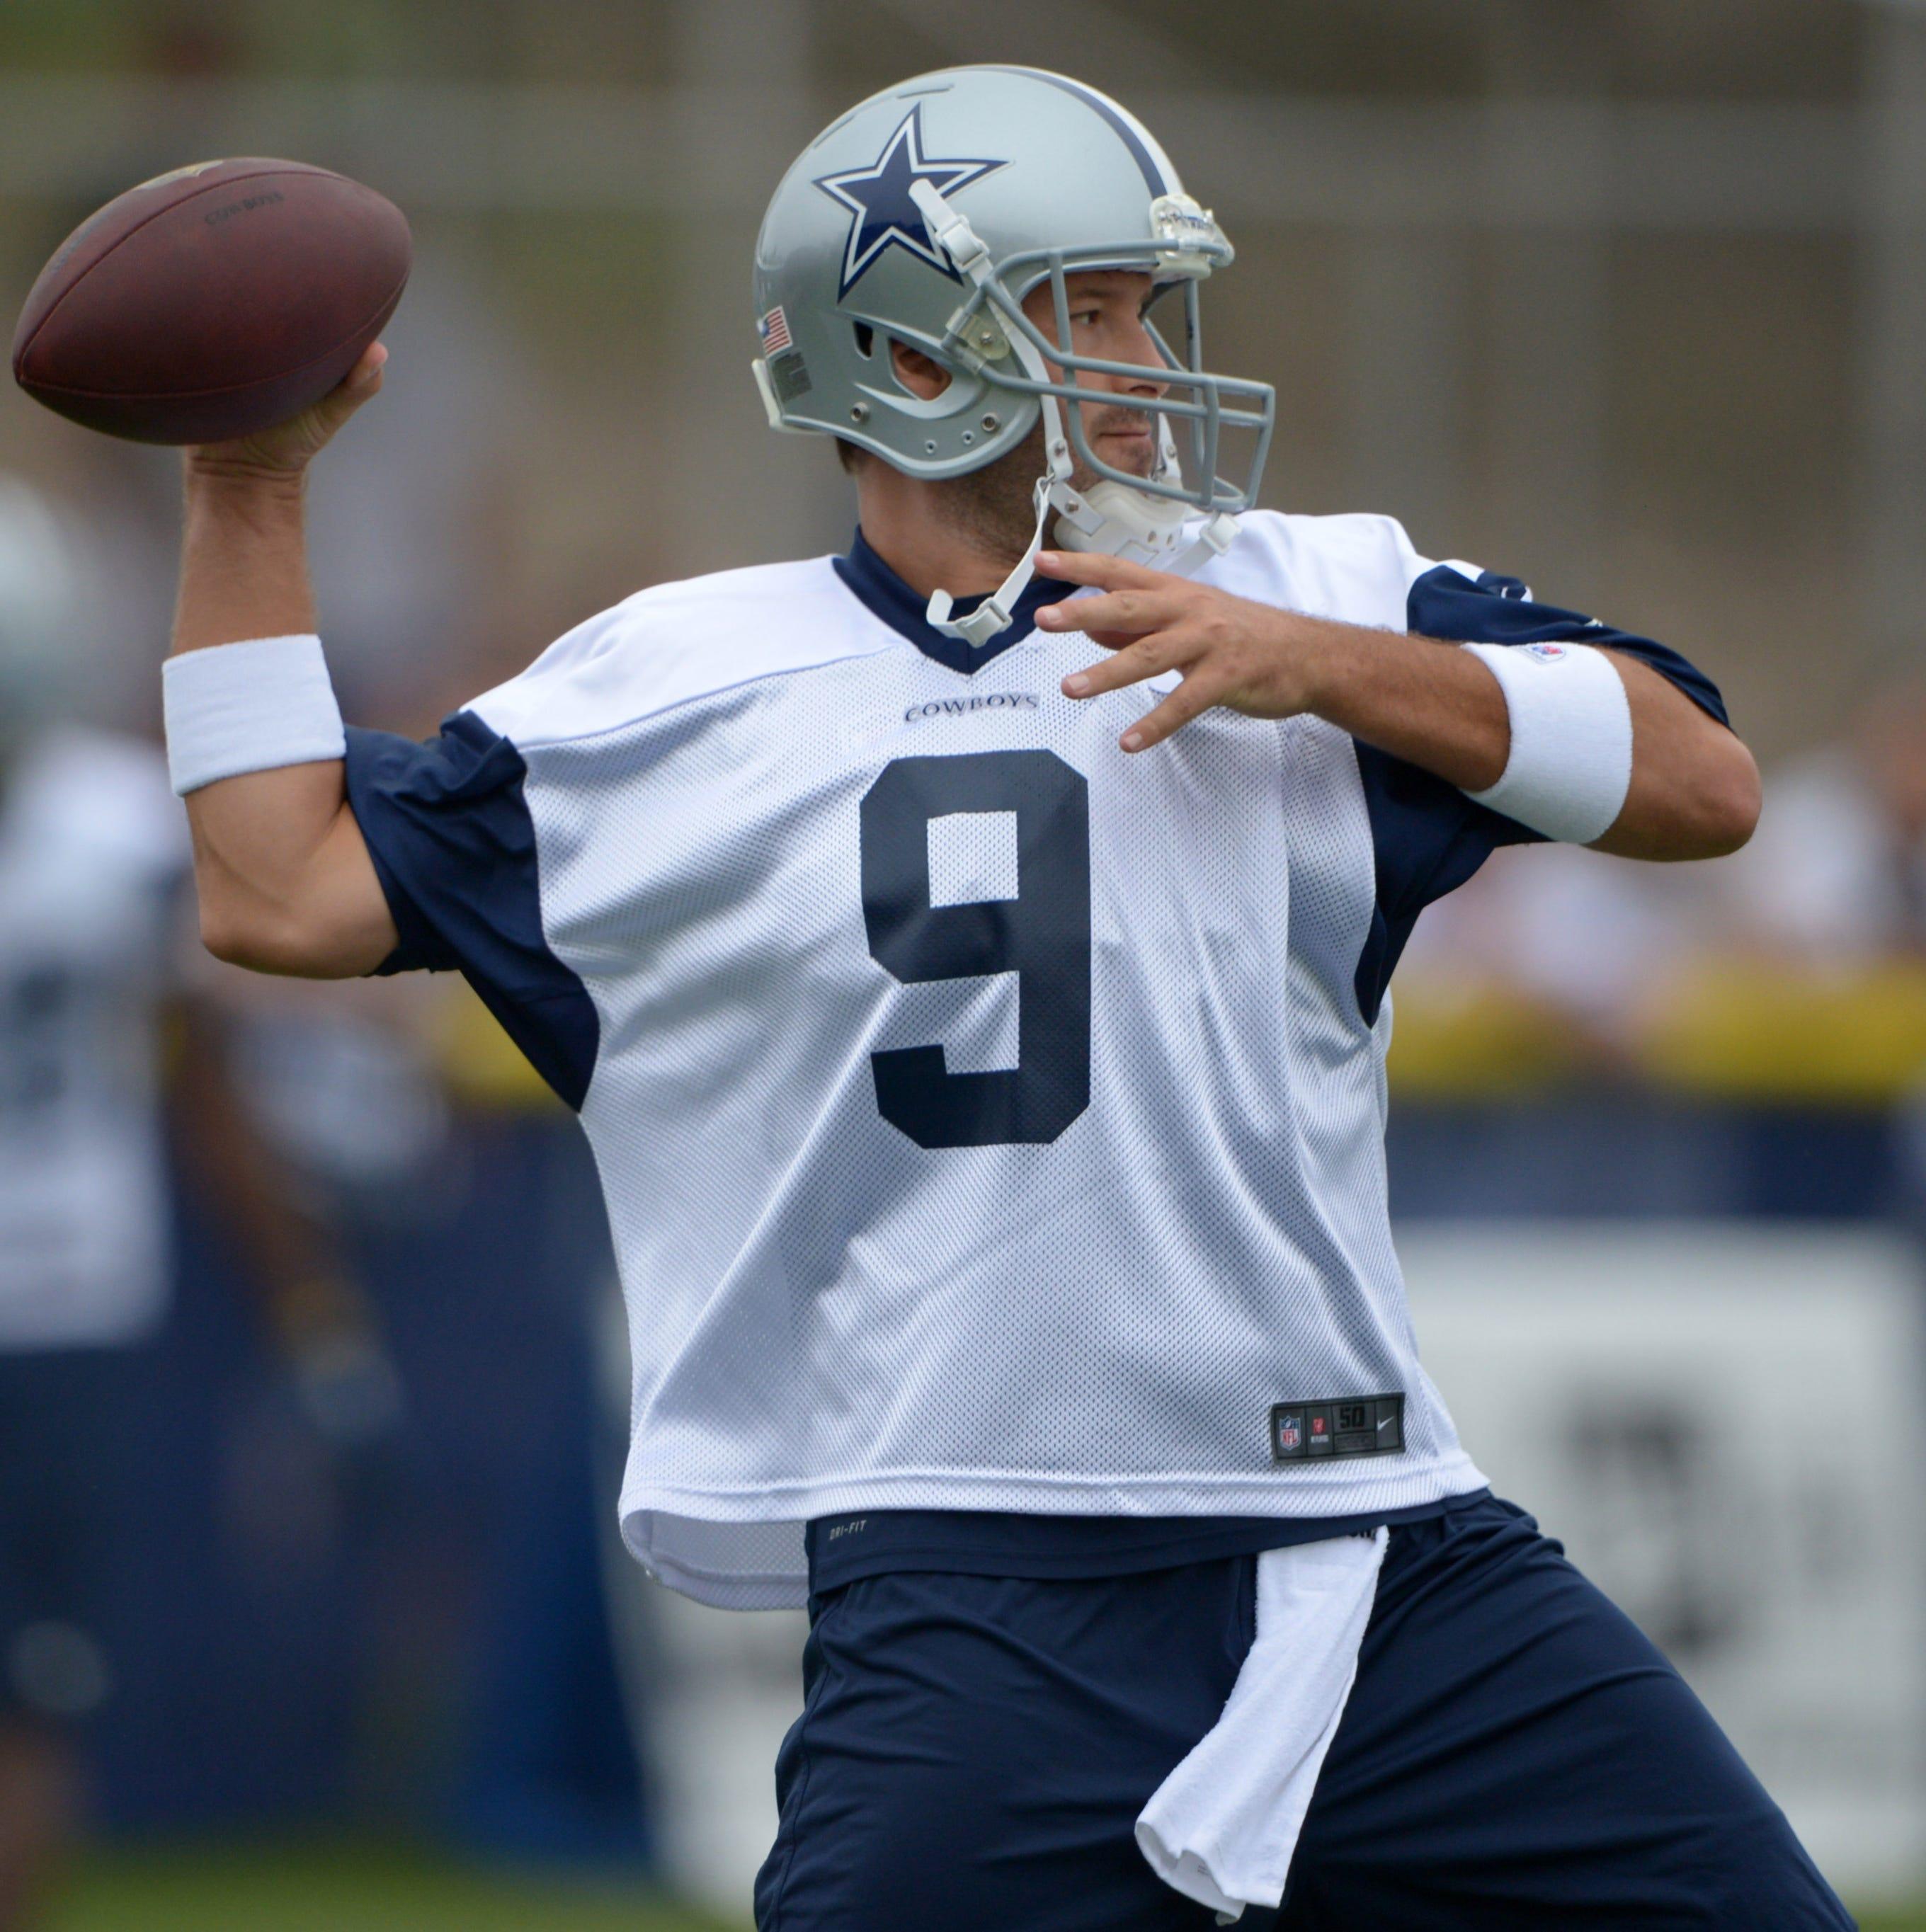 Dallas Cowboys quarterback Tony Romo throws a pass at training camp at the River Ridge Fields.